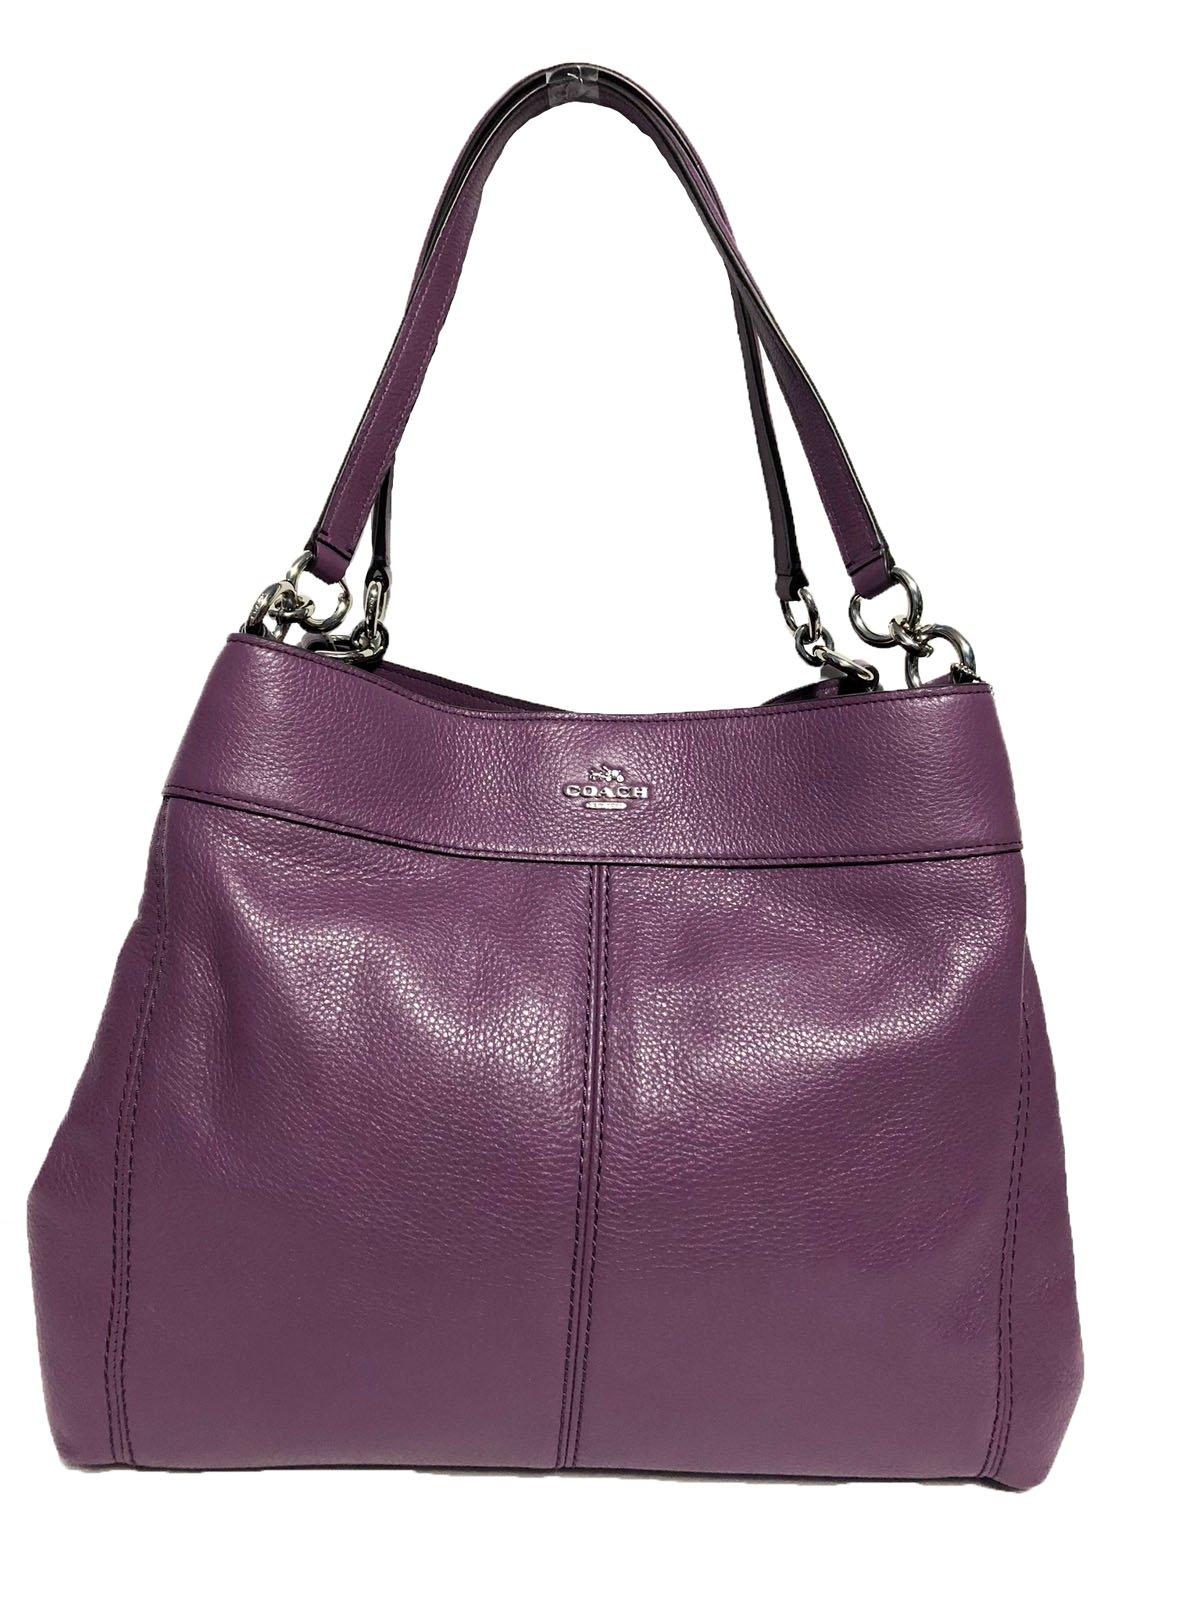 Coach F57545 Lexy Pebble Leather Shoulder Bag (SV/Berry)